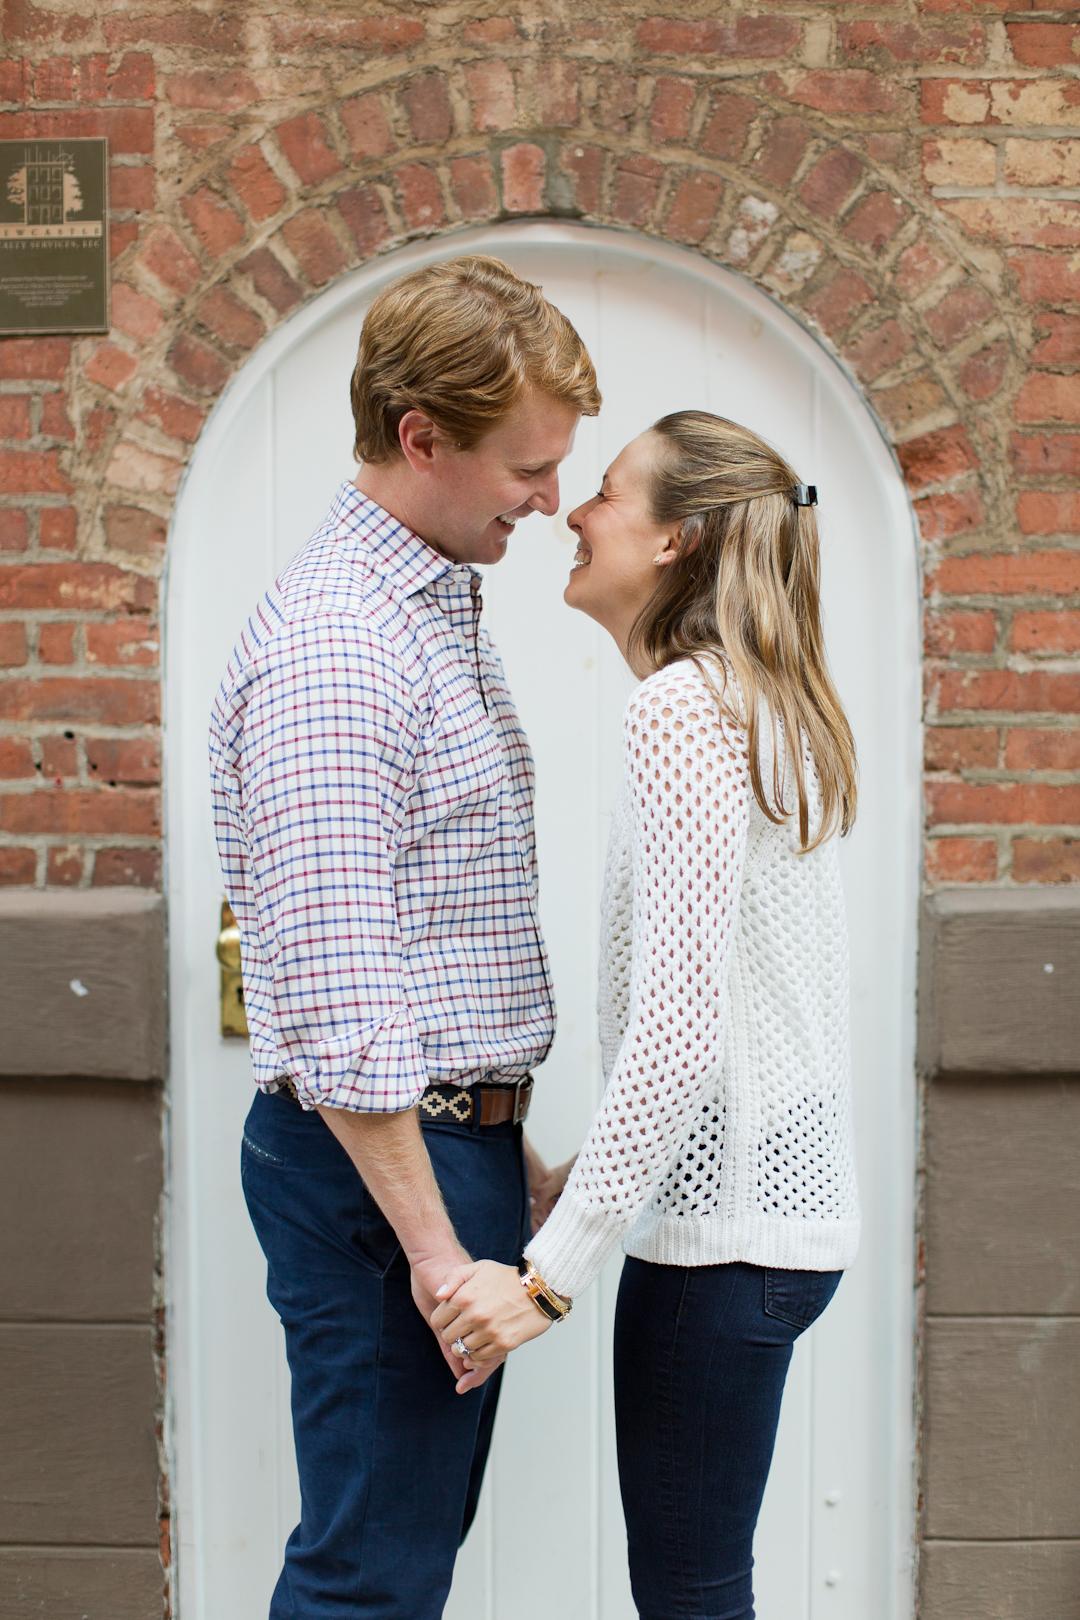 Melissa Kruse Photography - Megan & Tyler West Village Engagement Photos-22.jpg